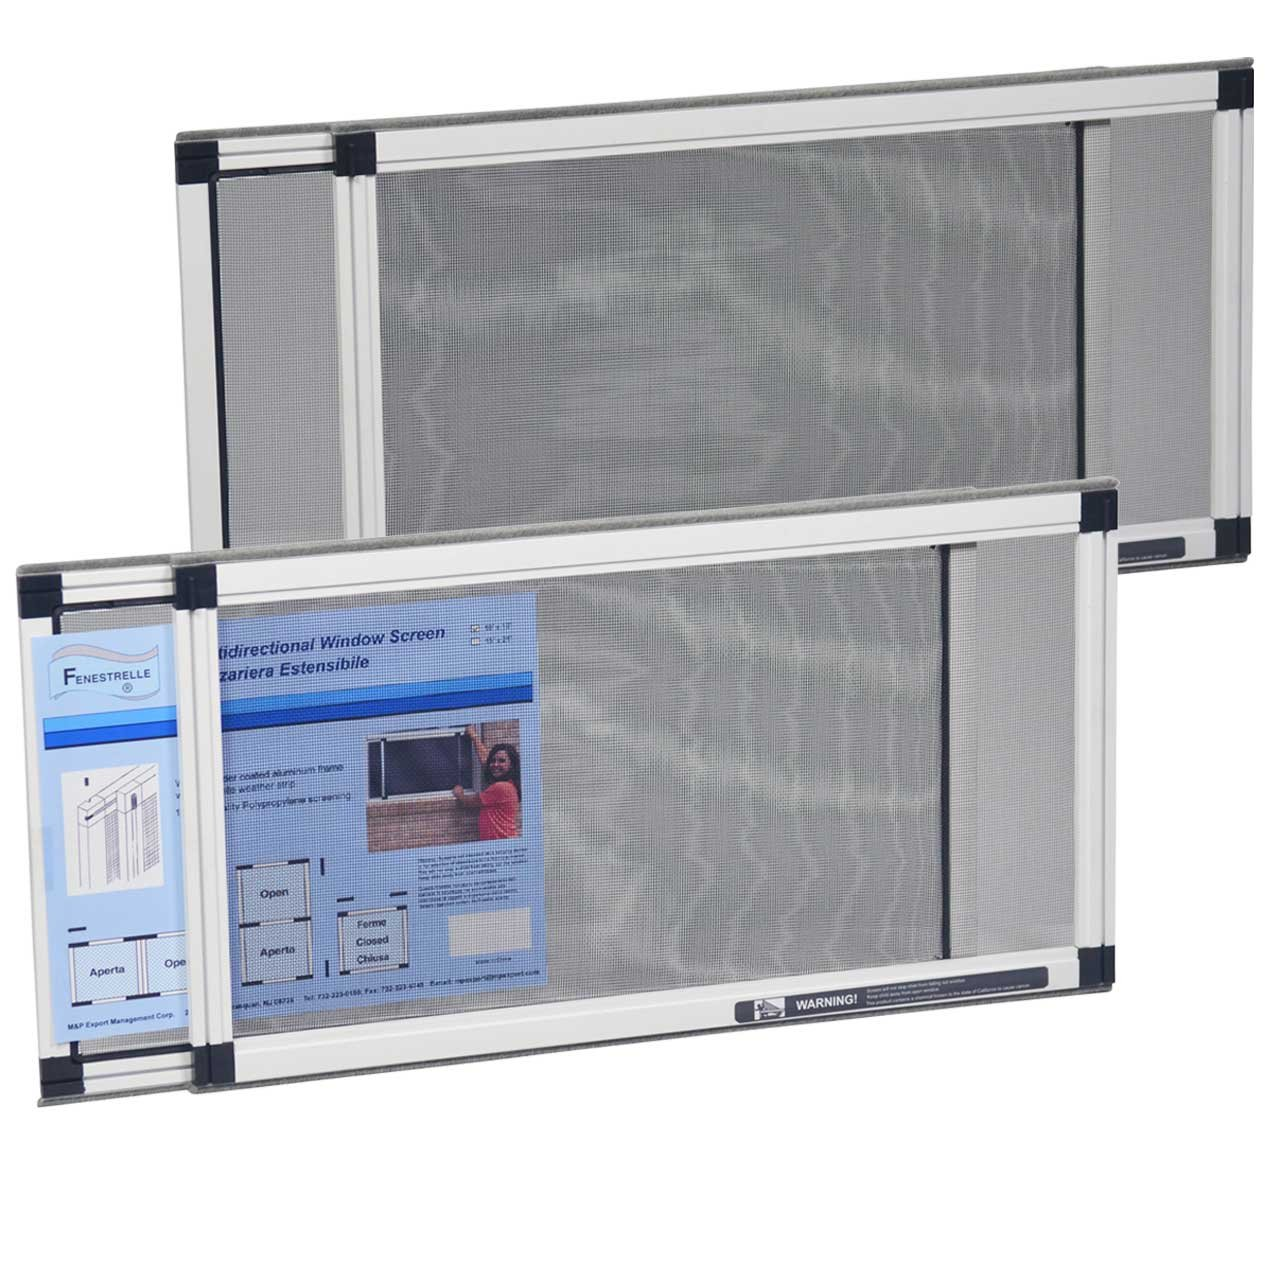 Fenestrelle Adjustable Window Screen, 2 Way Adjustable, Horizontal (10'' x19-36 w) Or Convert to Vertical (19'' x10-18 w) - 2 Pack